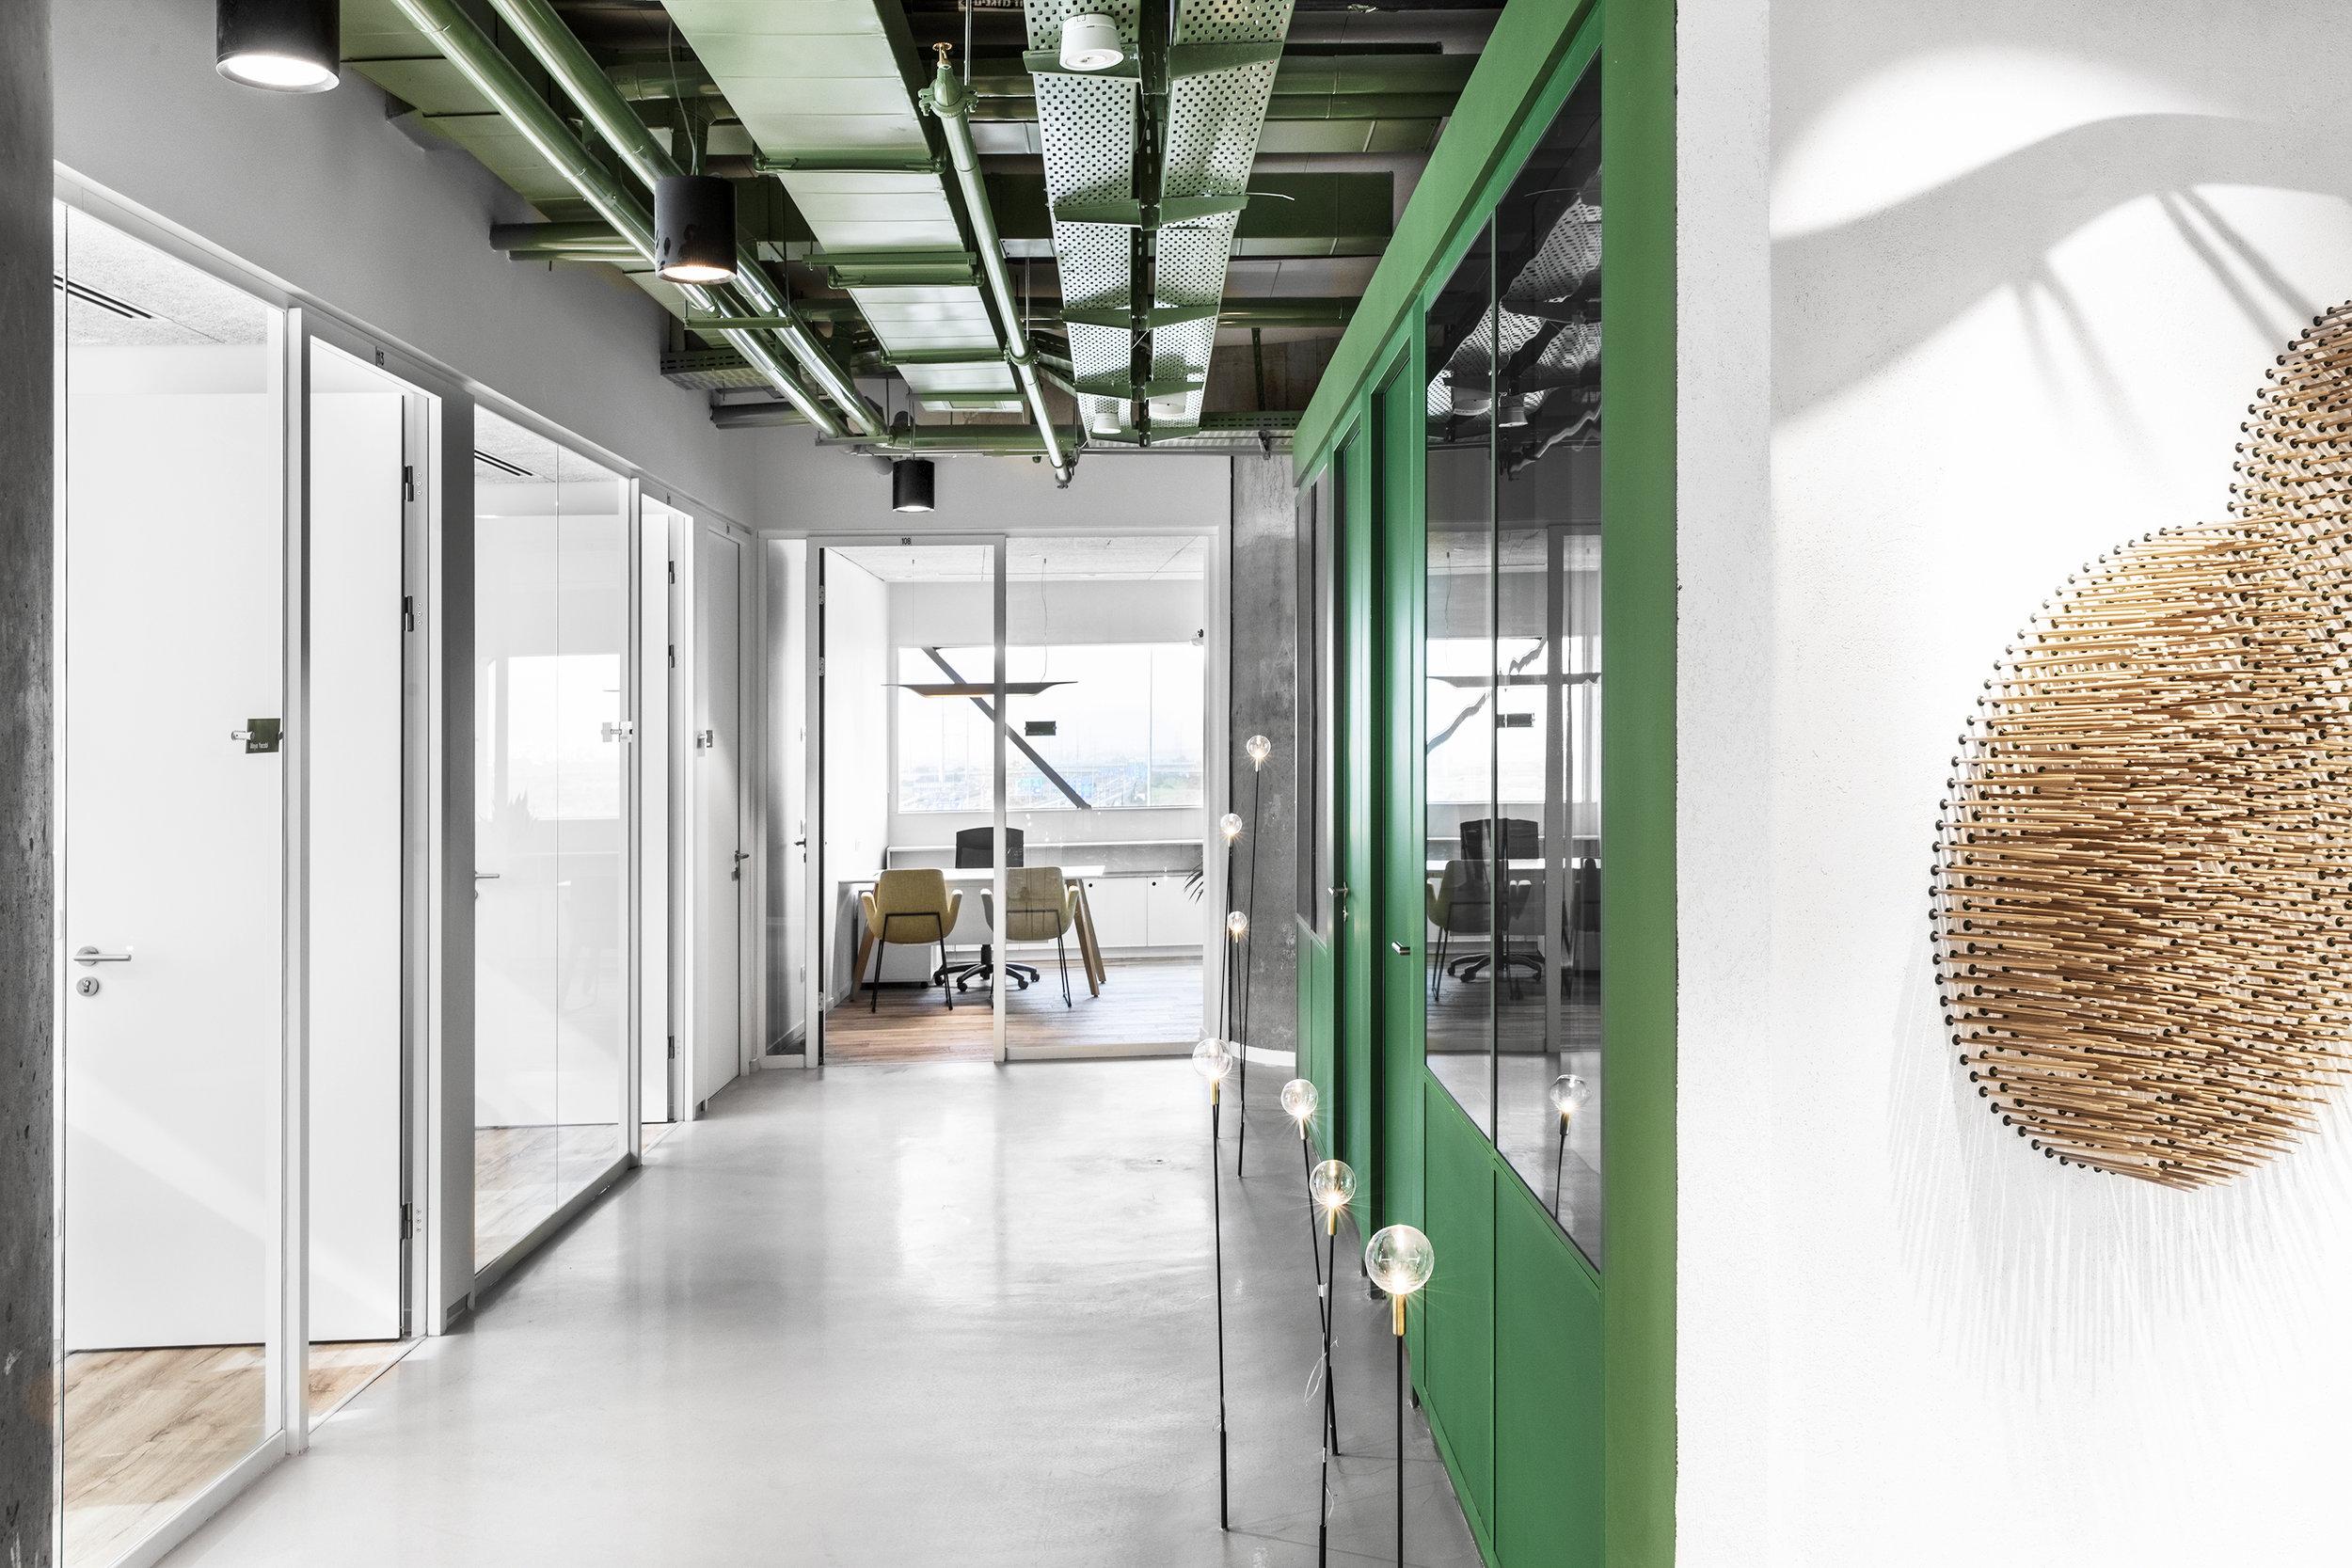 HINNOMAN - ROY DAVID ARCHTECTURE - STUDIO - סטודיו רואי דוד - אדריכלים (22).jpg